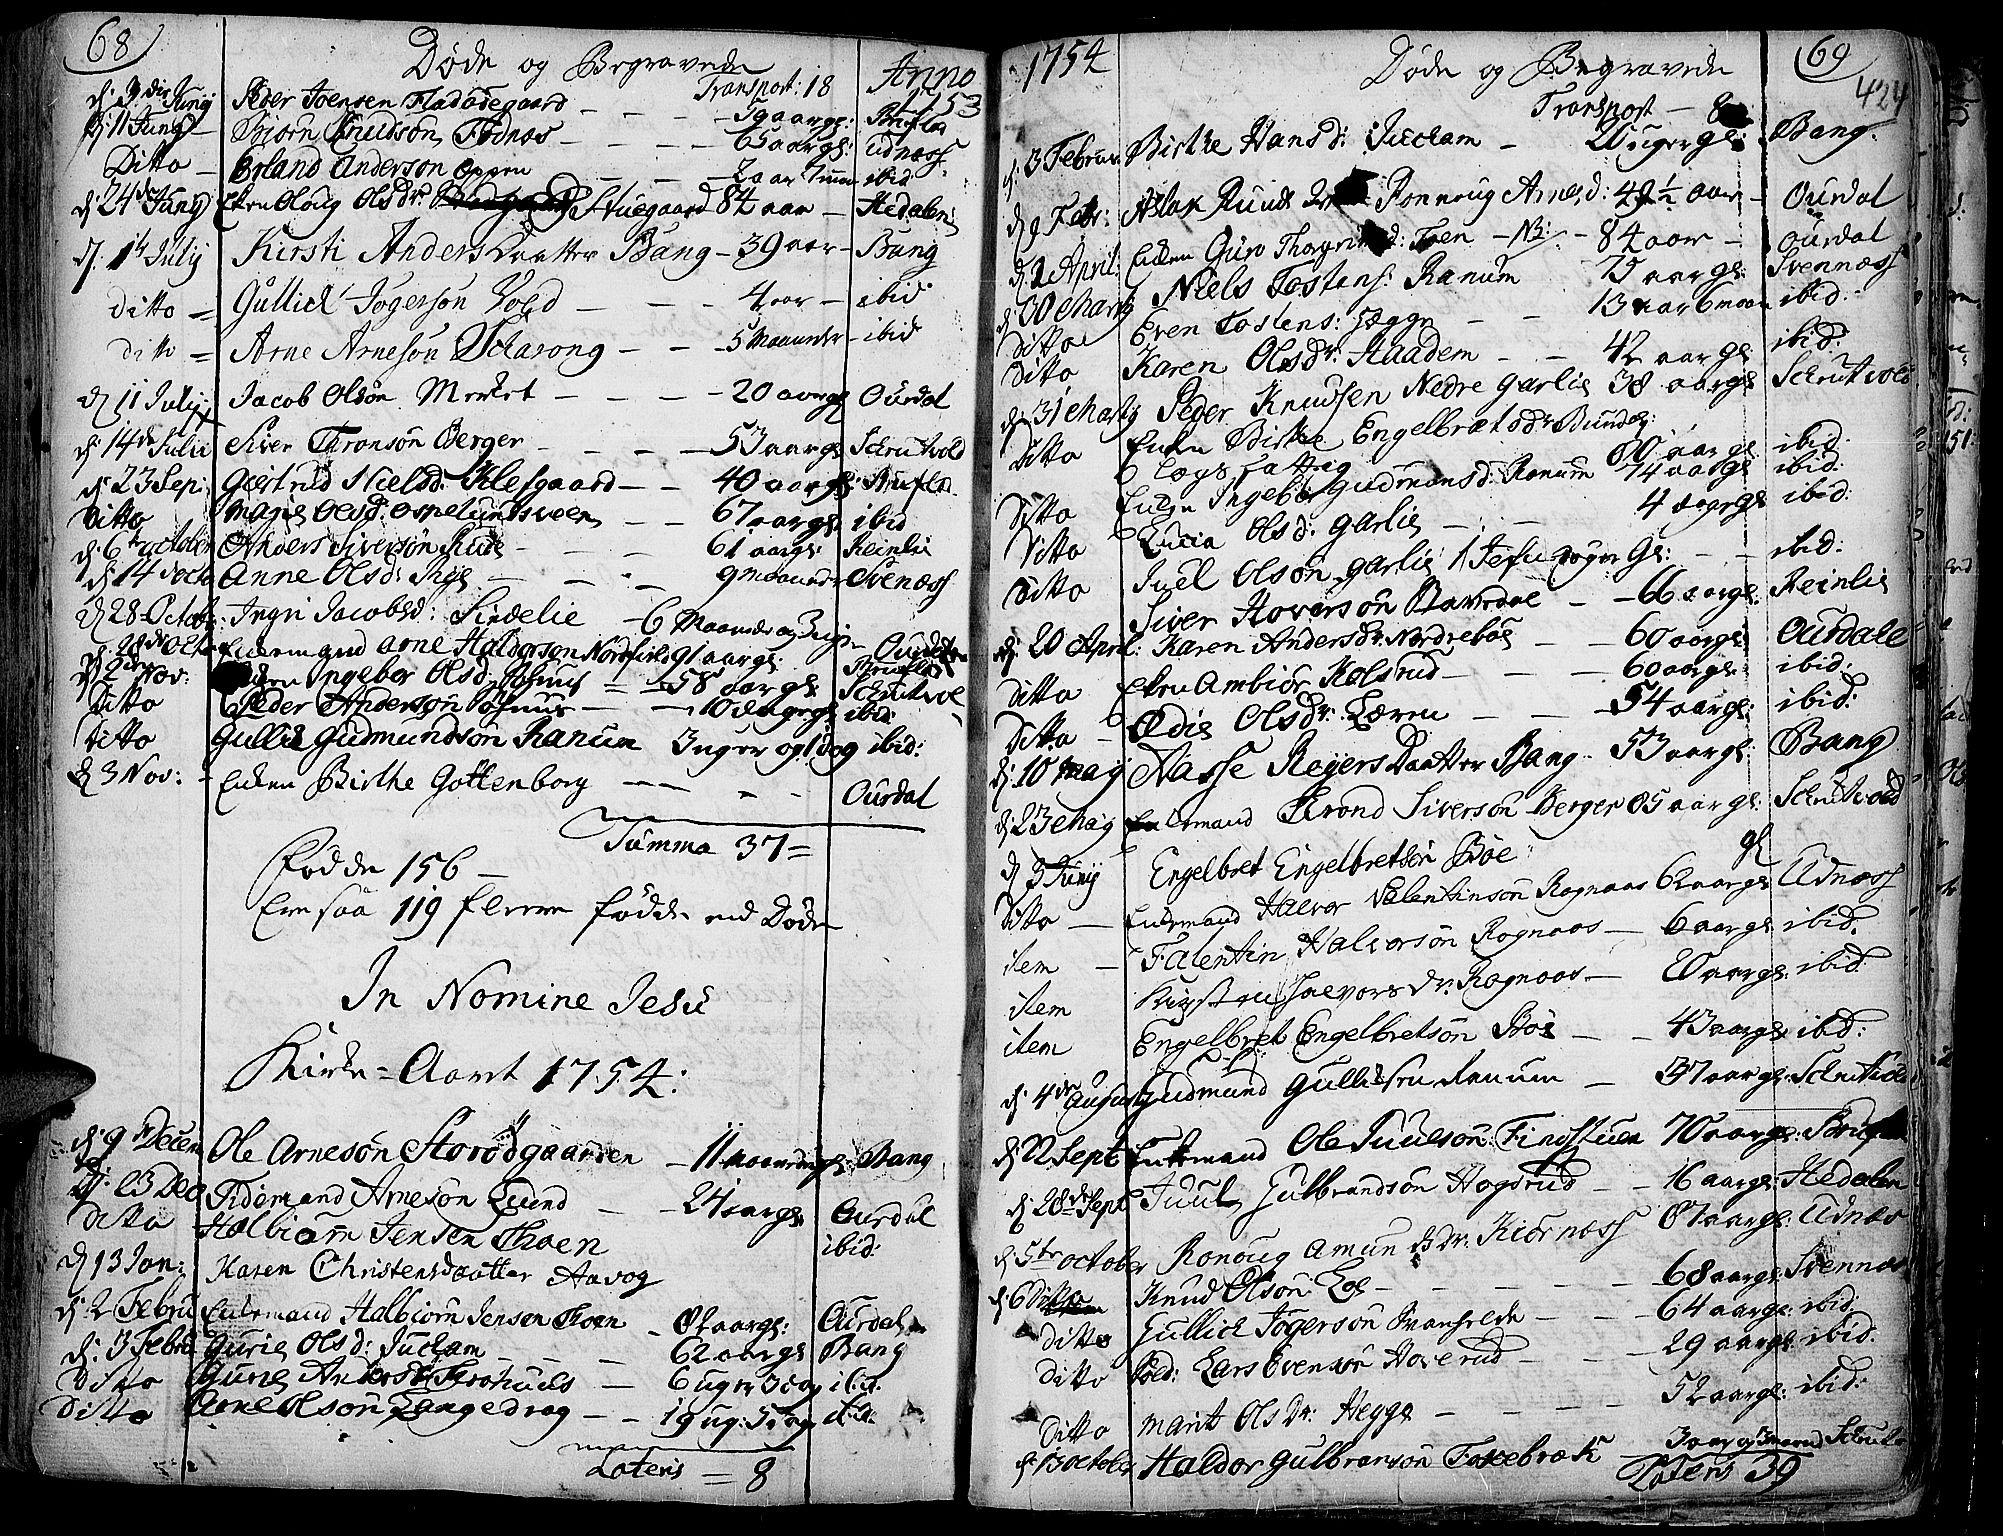 SAH, Aurdal prestekontor, Ministerialbok nr. 4, 1730-1762, s. 68-69